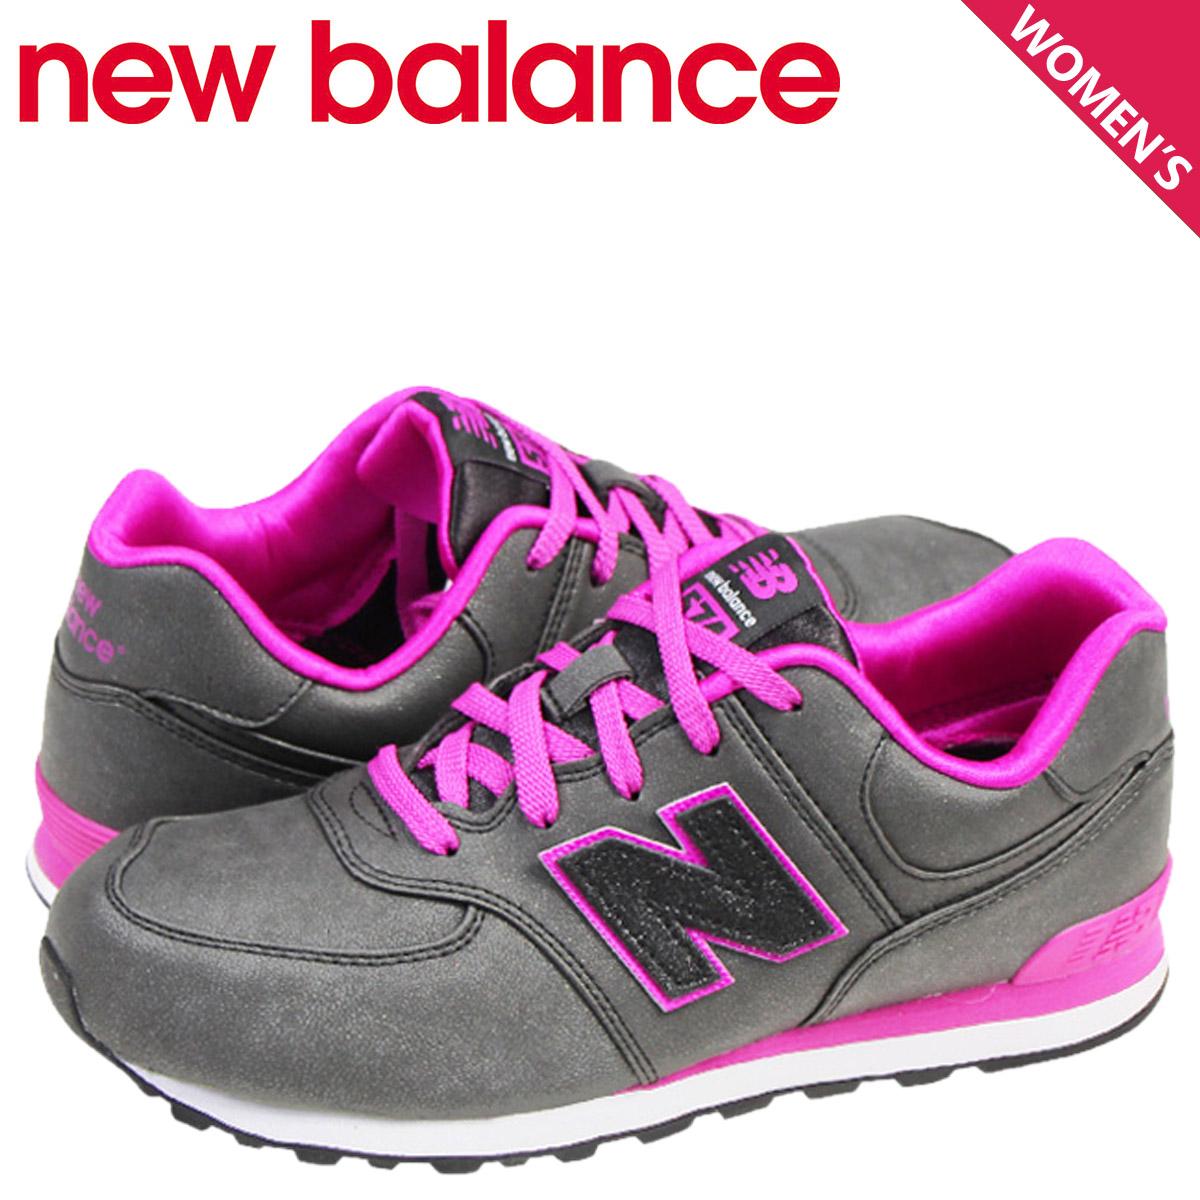 new balance new balance 574 kids women s sneaker KL5741MG M wise shoes grey 01792249f